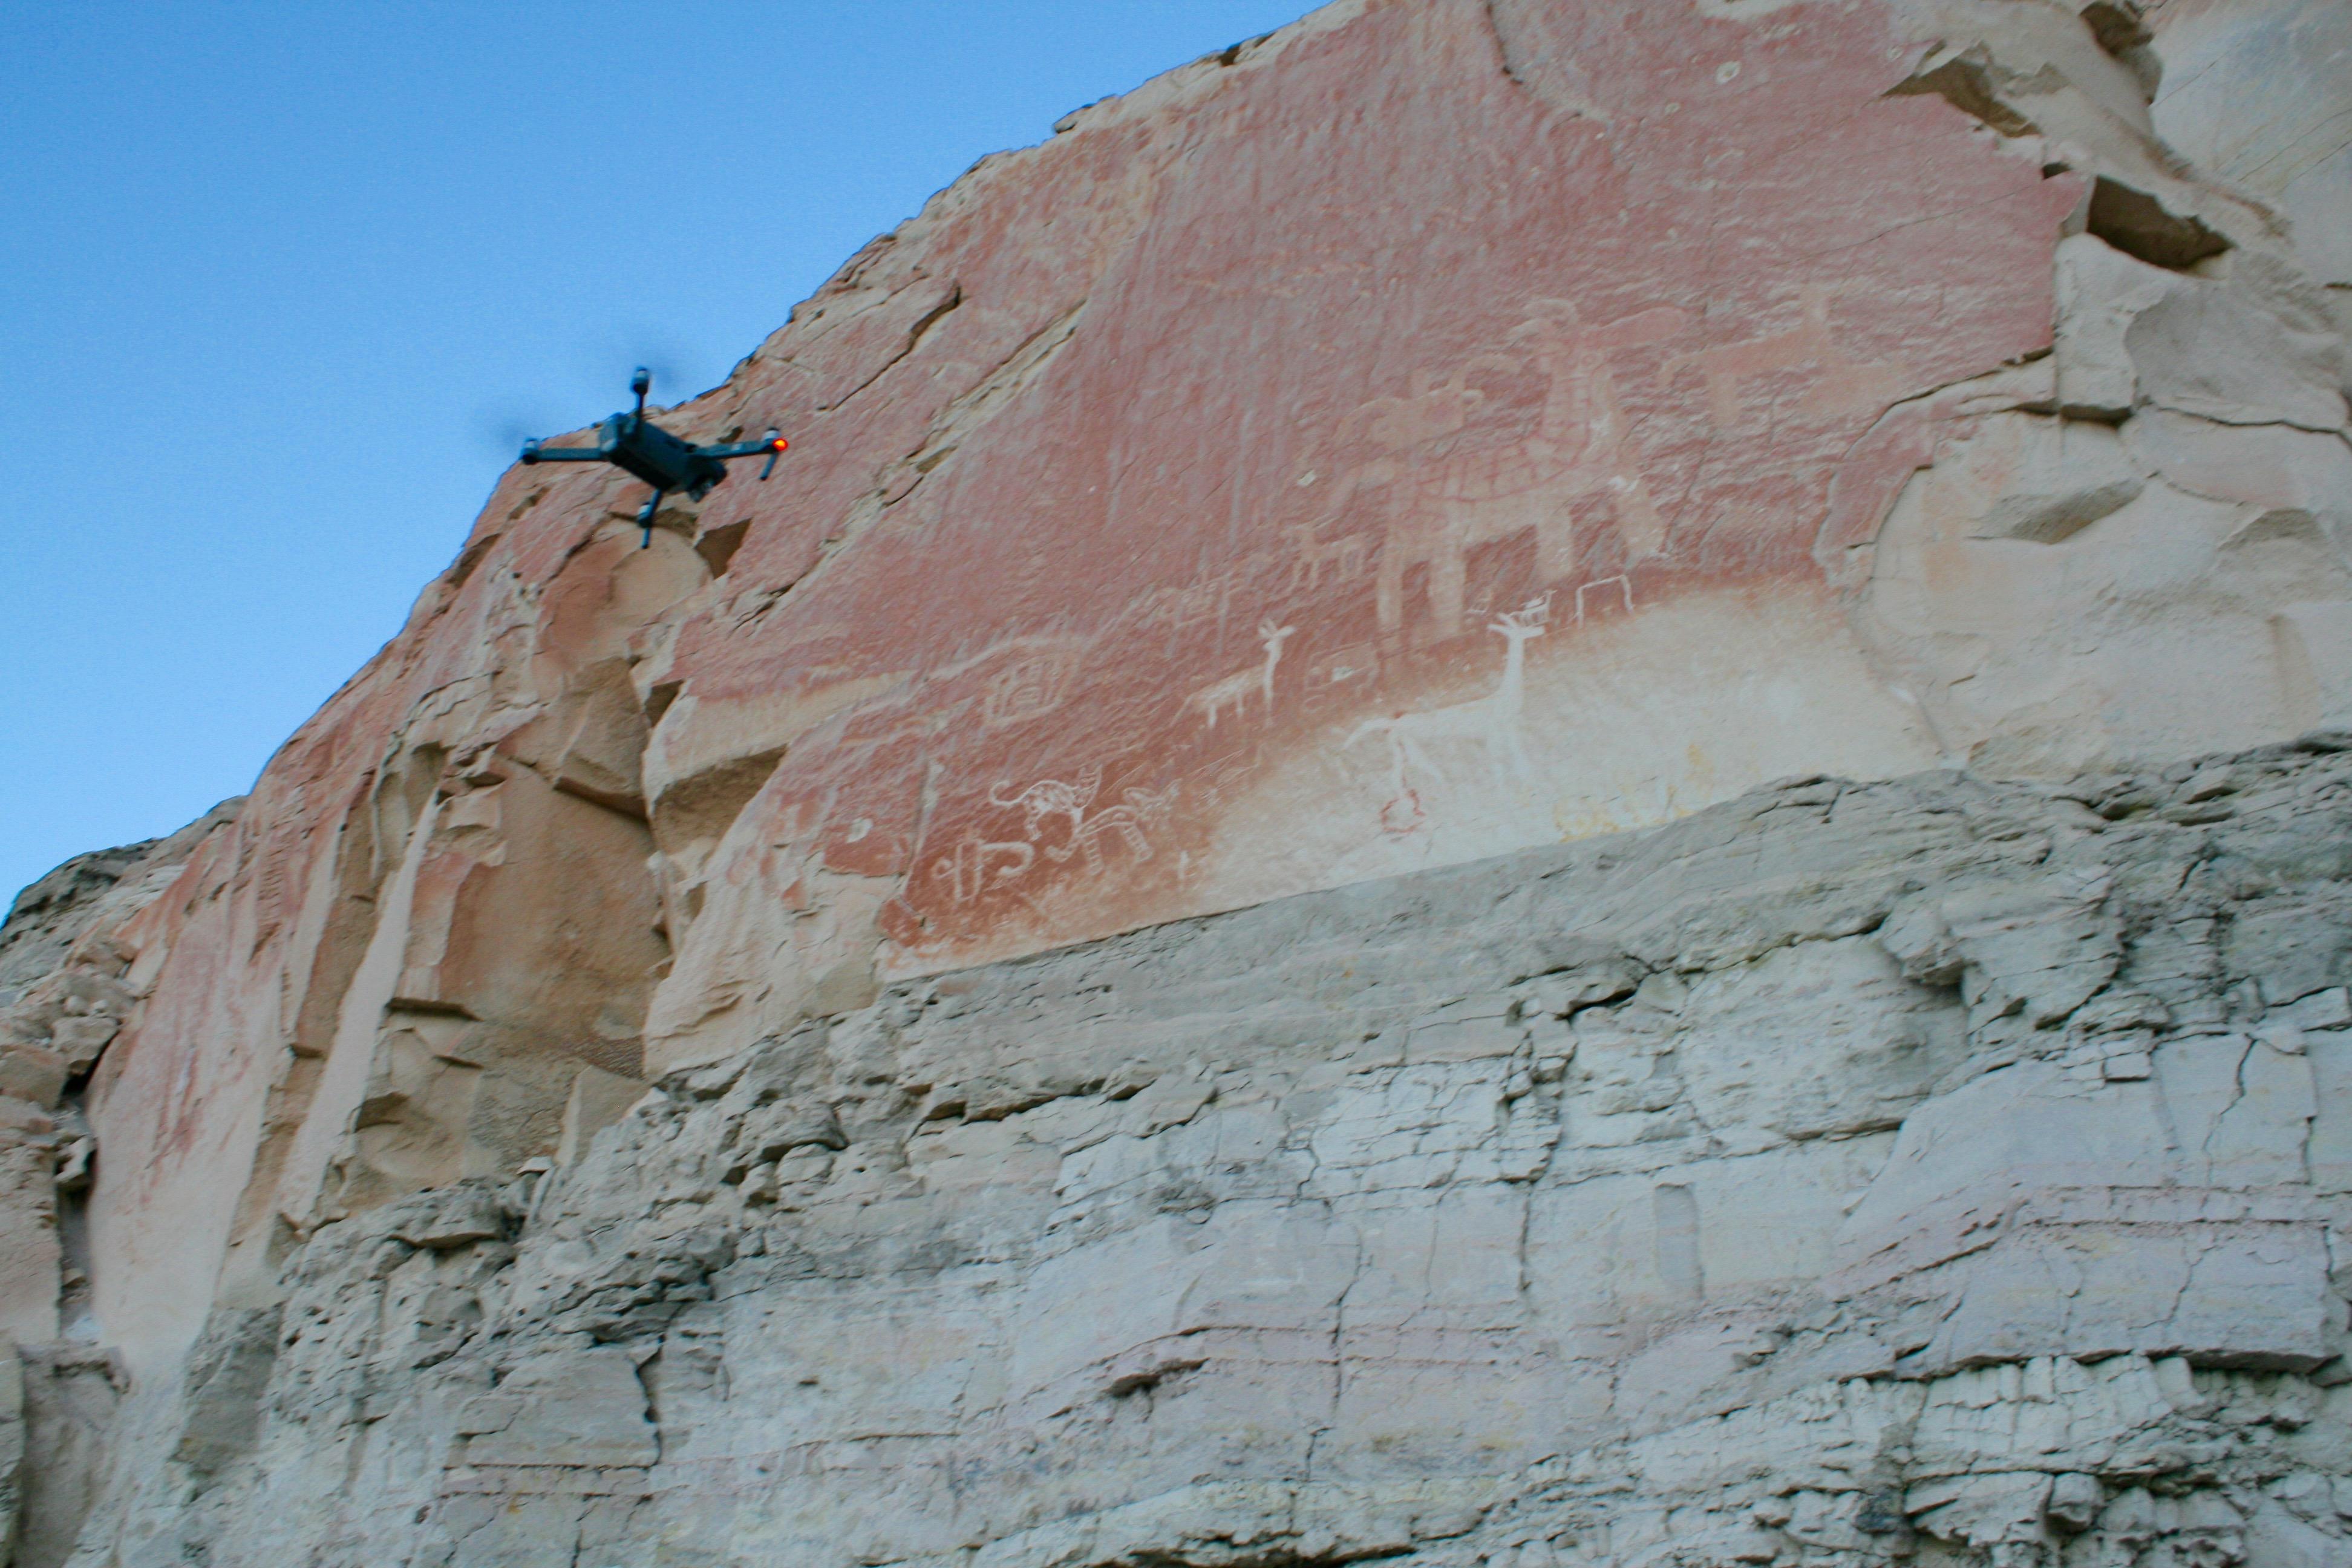 Drone Imaging Rock Art